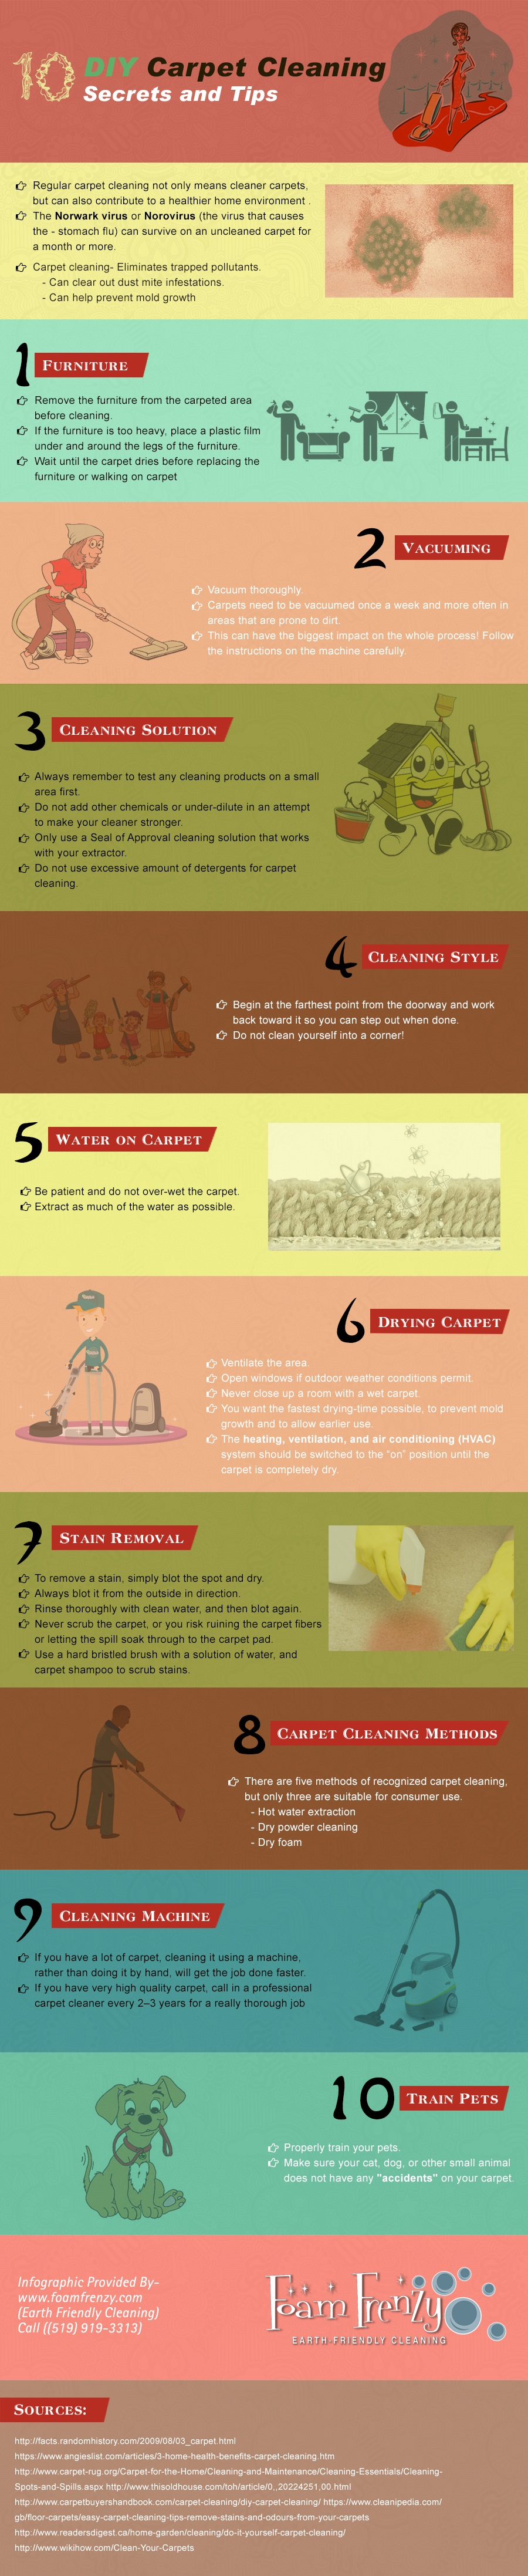 DIY Carpet Cleaning Secrets & Tips (Infographic)   ecogreenlove